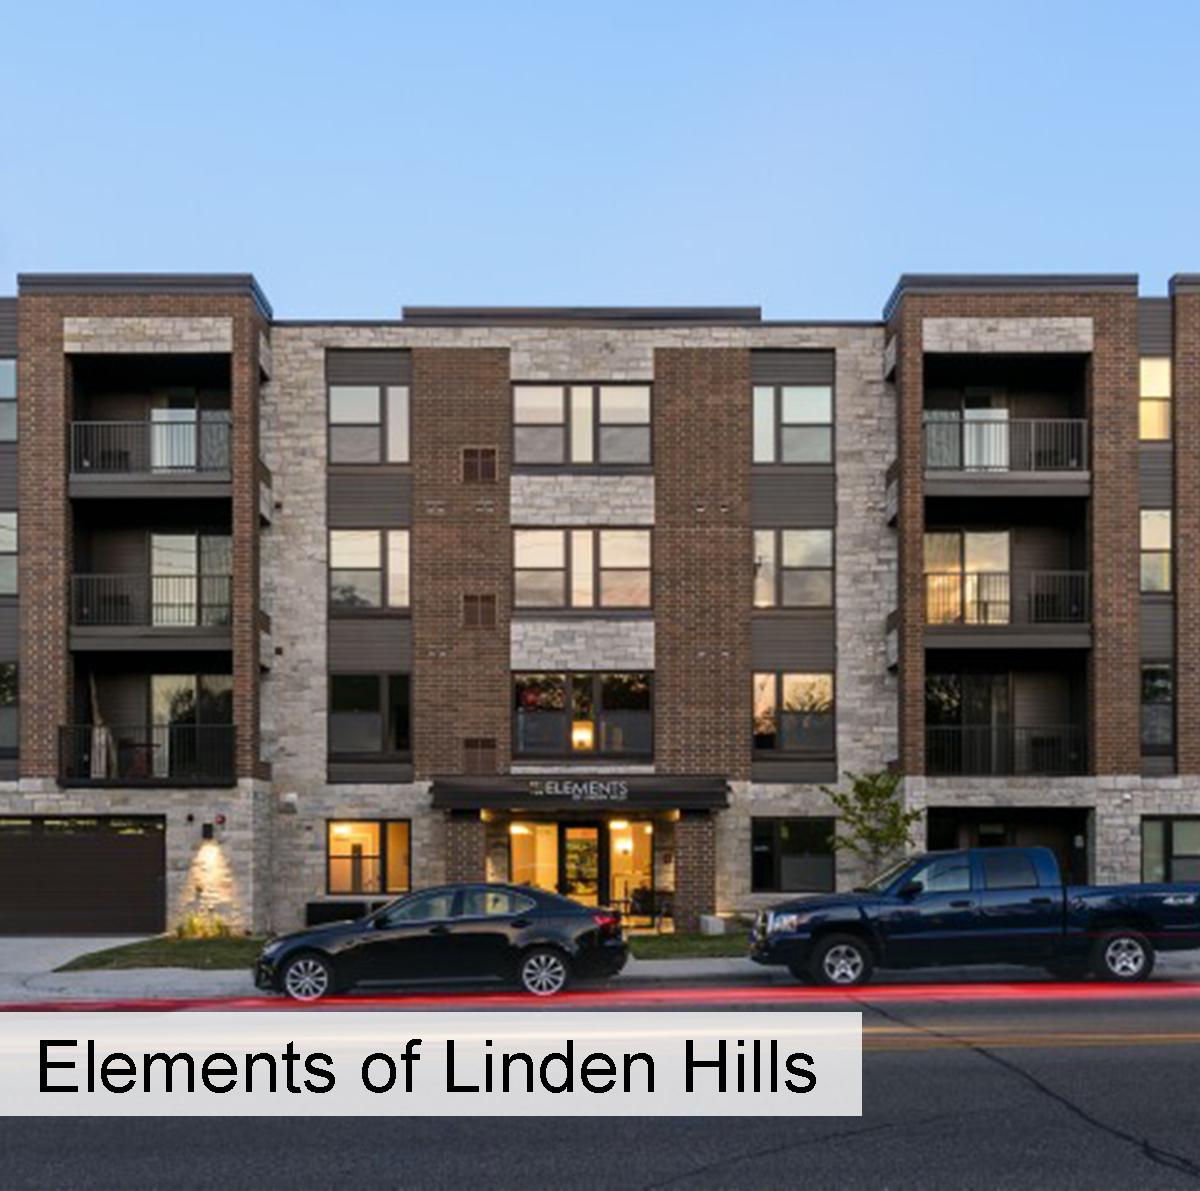 Elements of Linden Hills